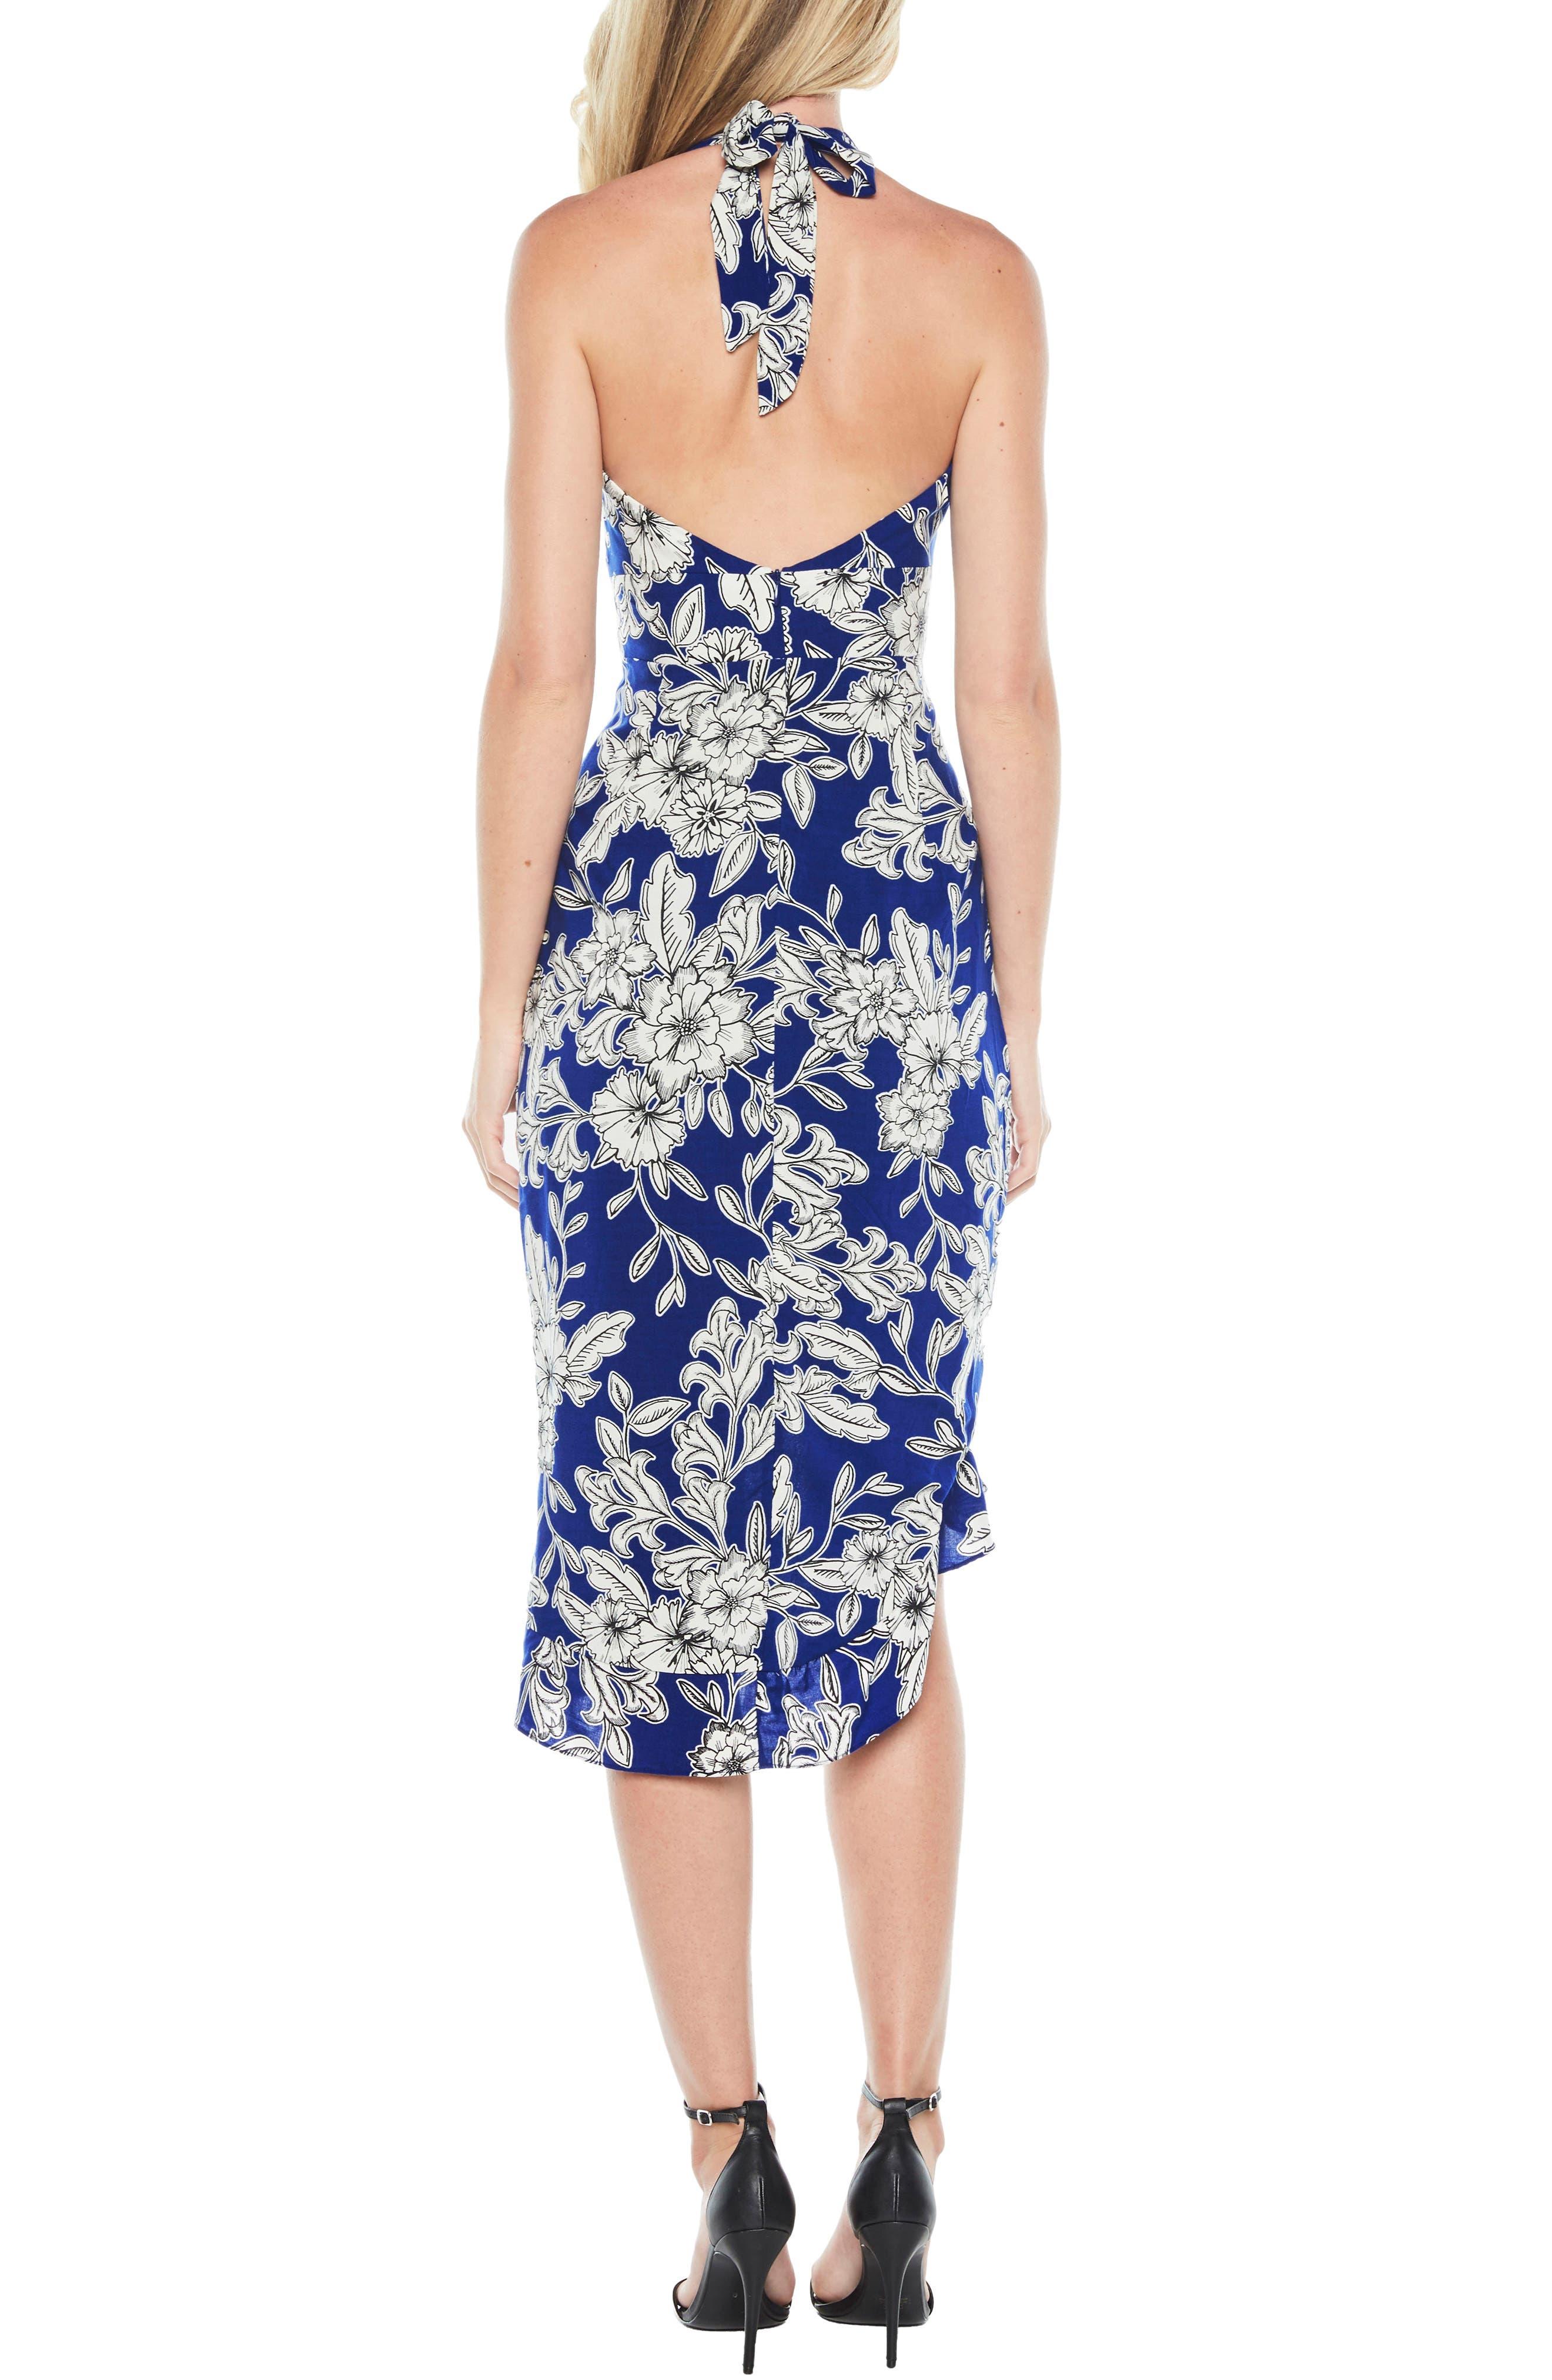 Petra Floral Dress,                             Alternate thumbnail 2, color,                             493